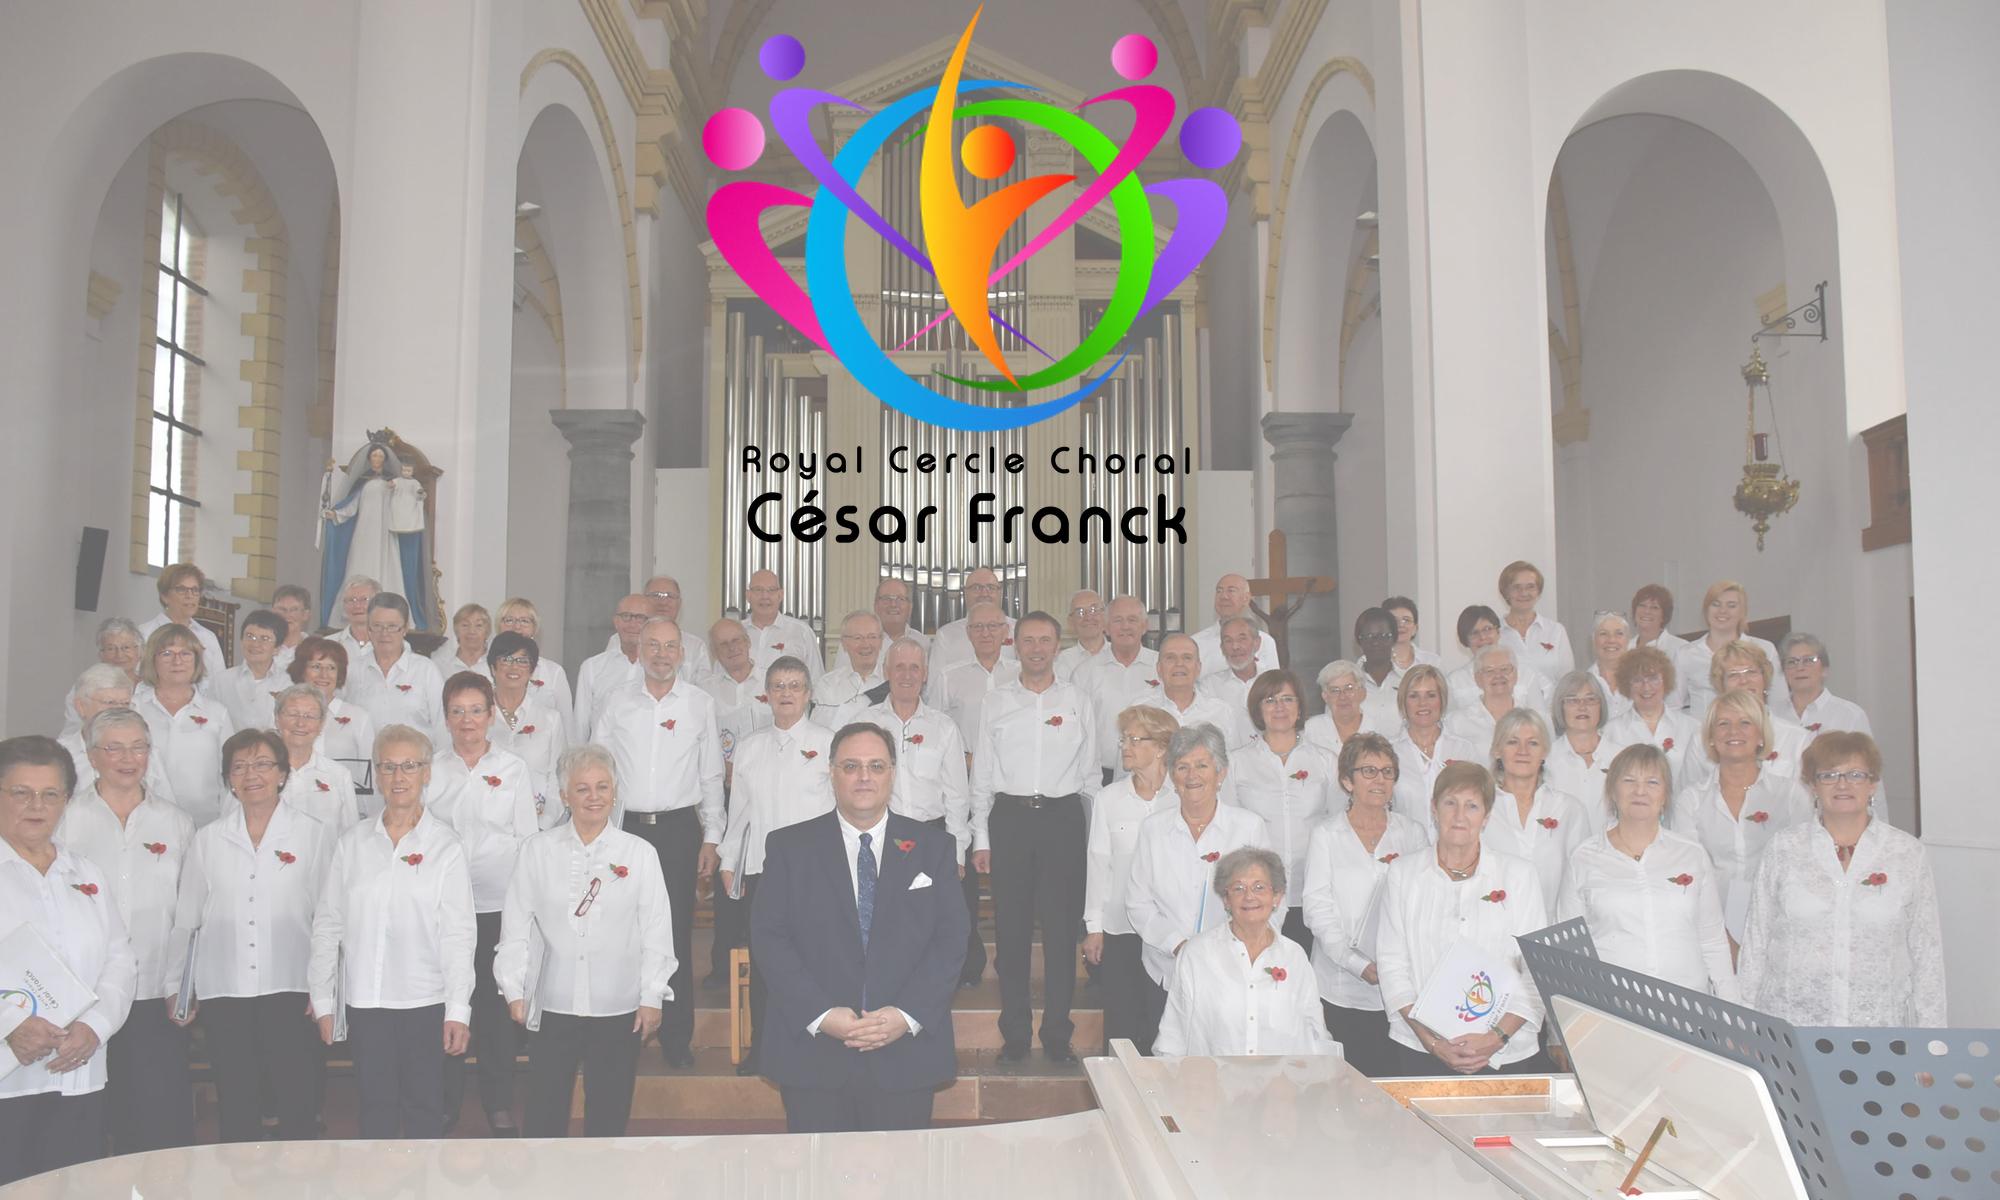 Royal Cercle Choral Cesar Franck